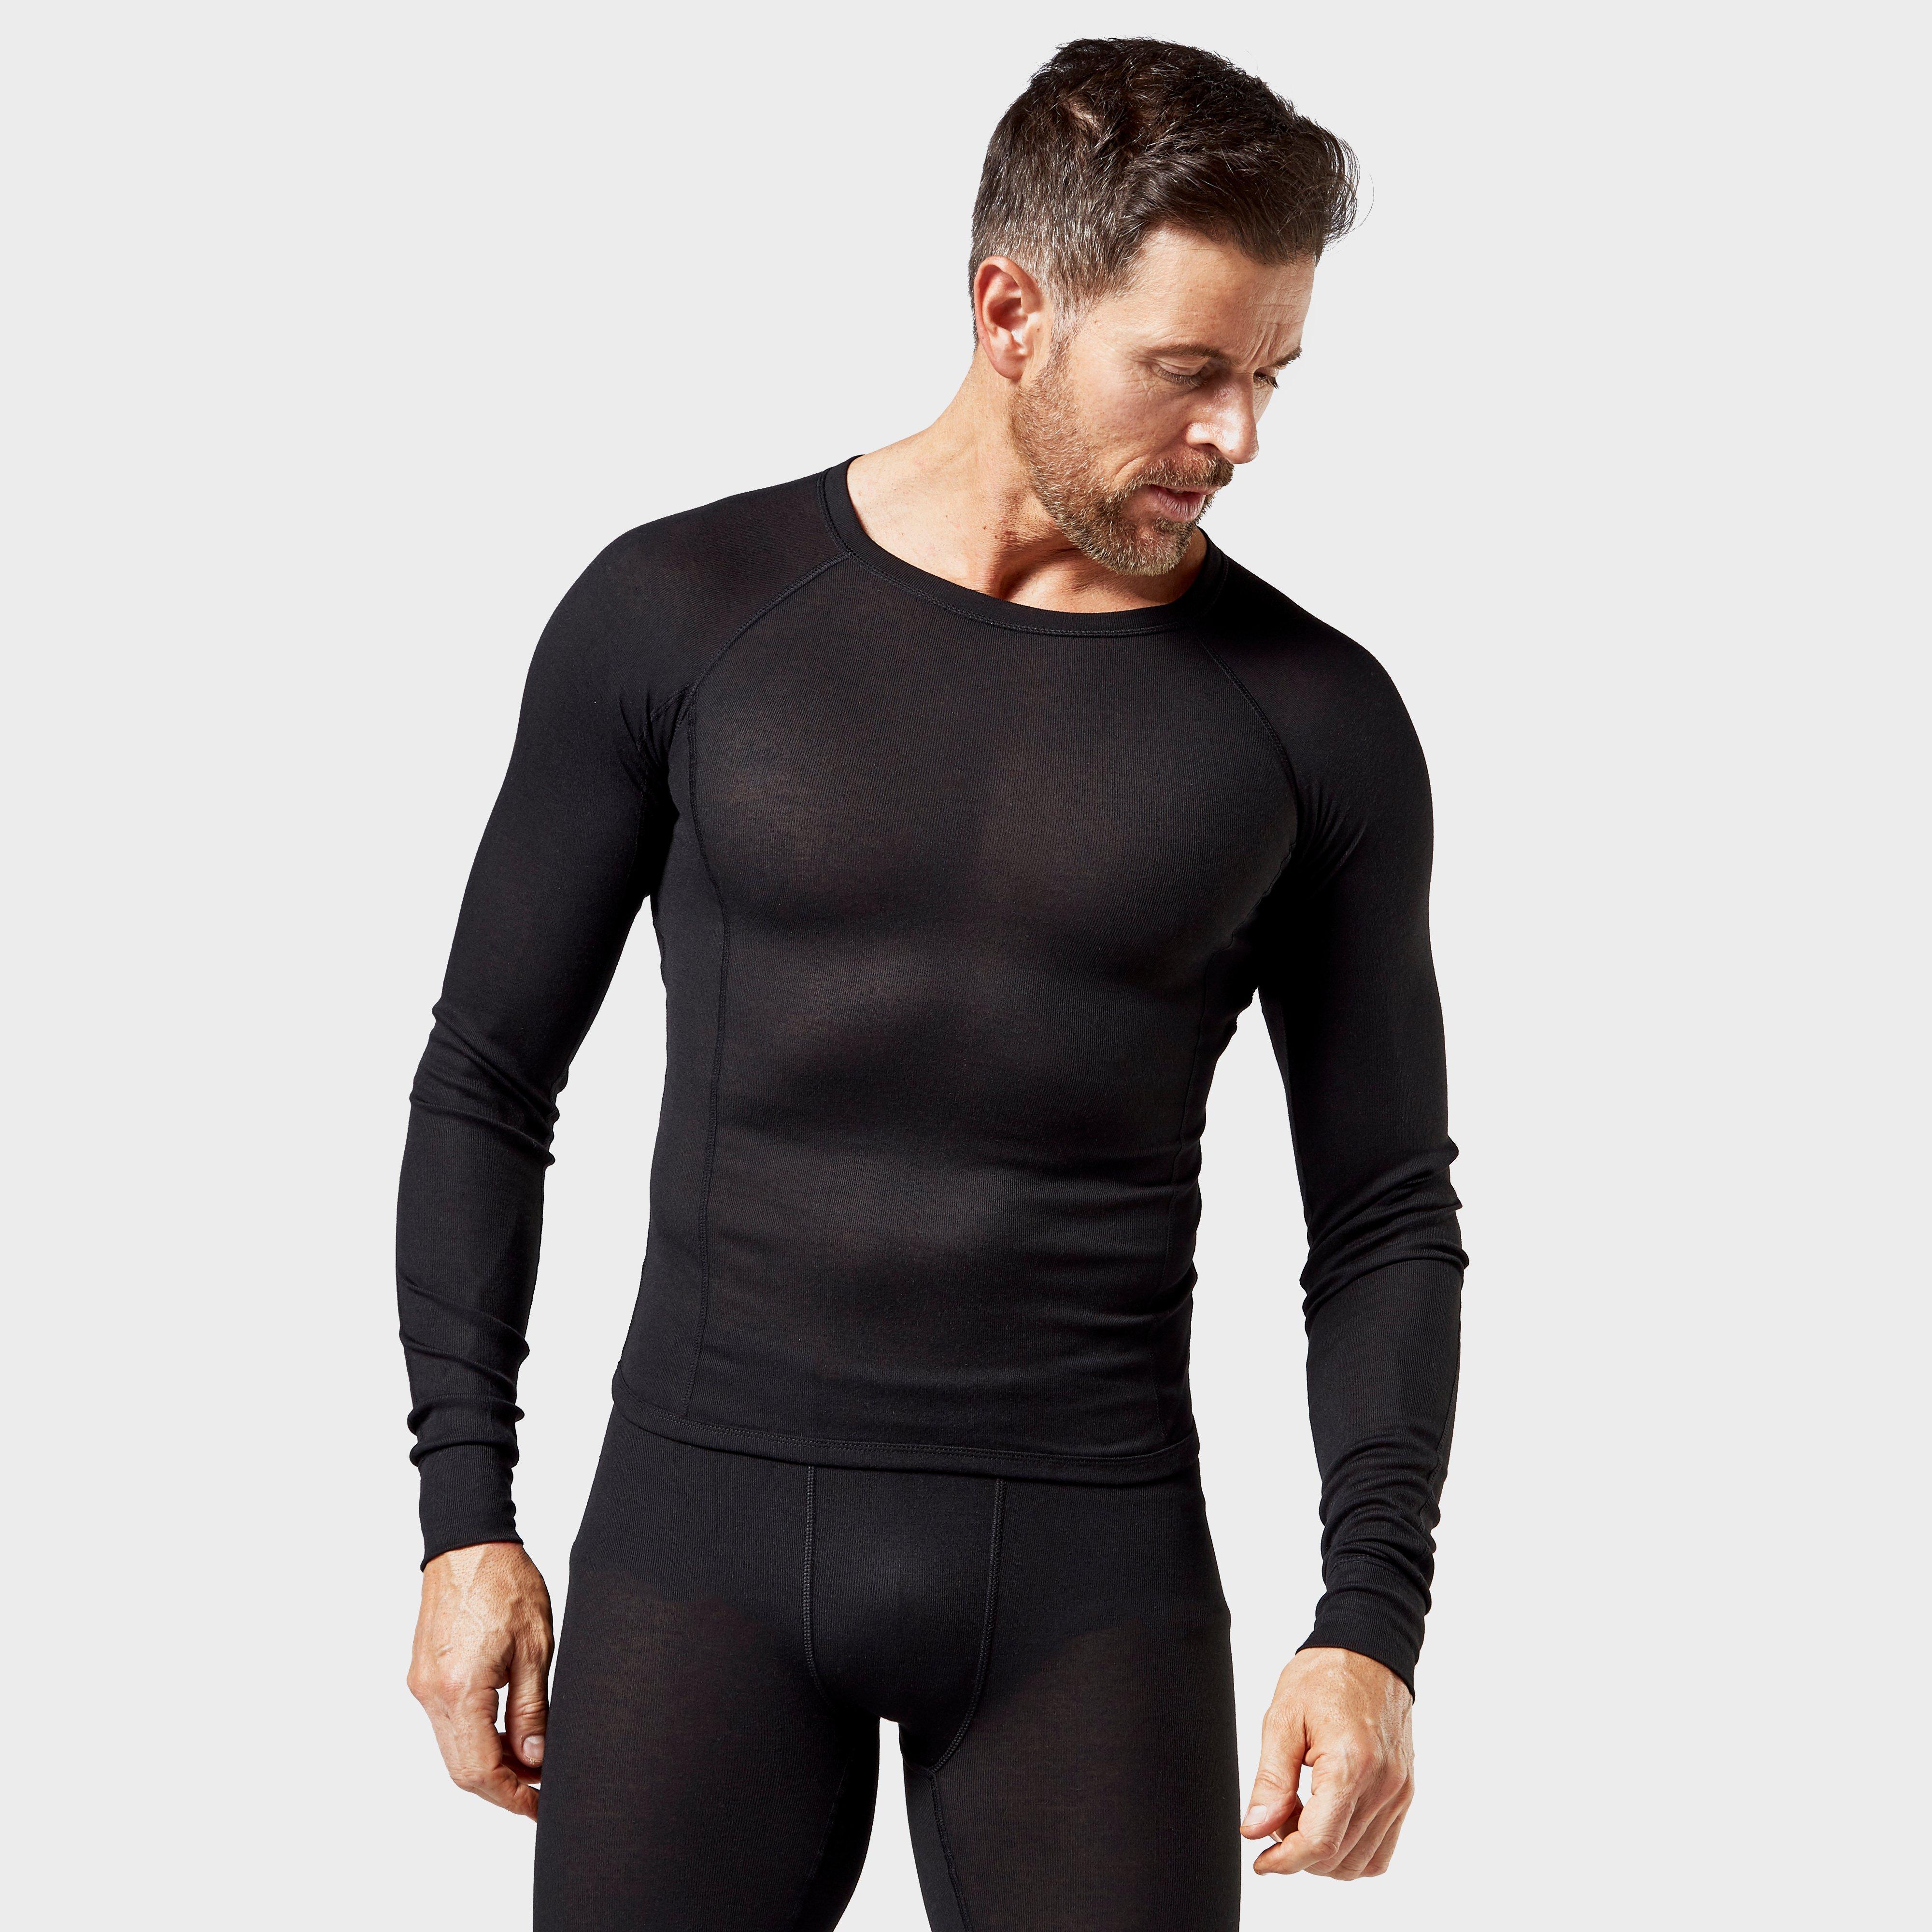 Men's Base Layers & Thermal Underwear   Blacks